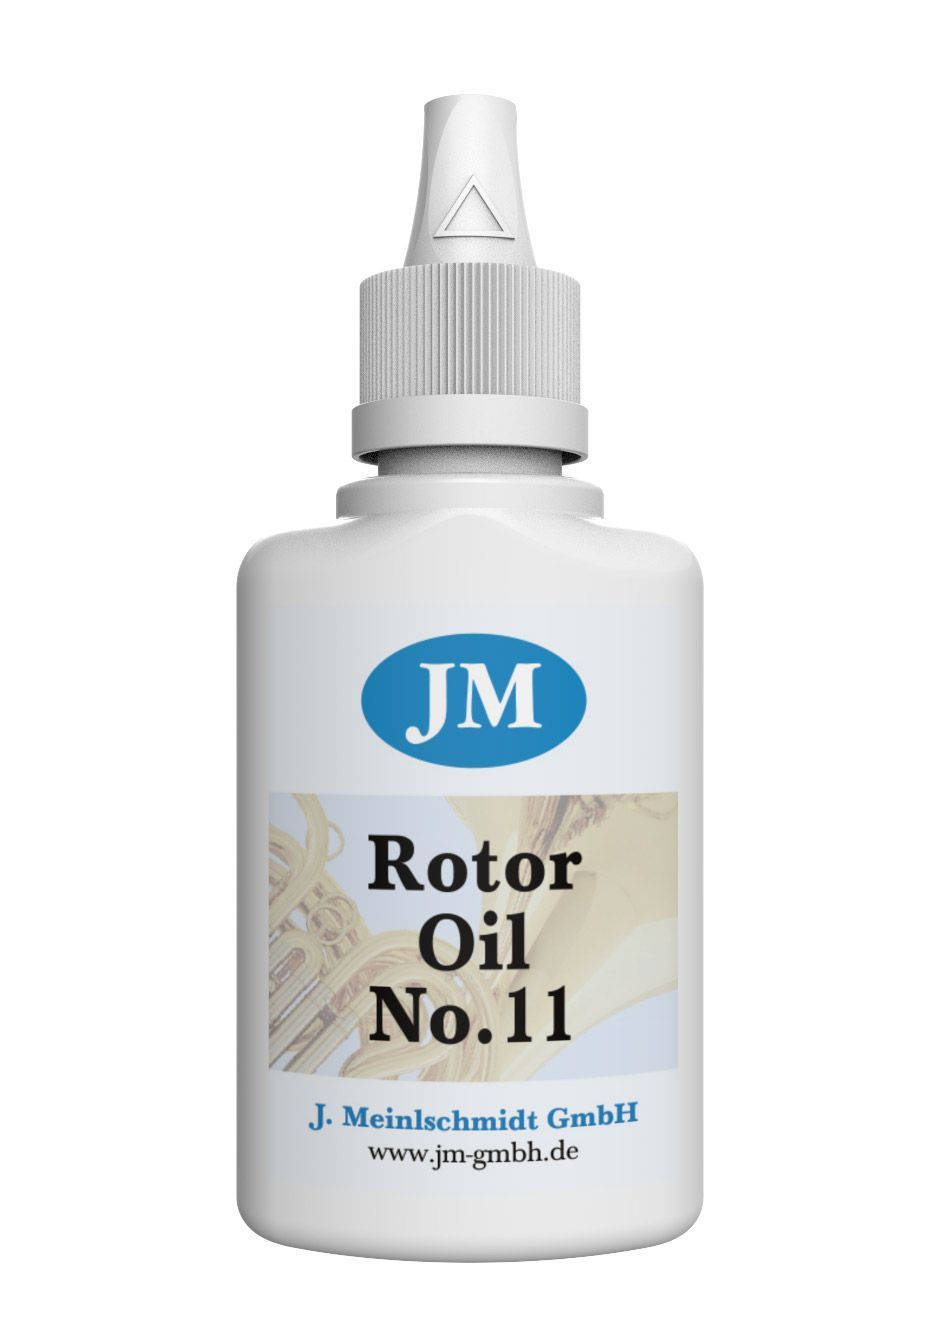 JM Rotor Oil Nr.11 Ventilöl für Zylinderventile